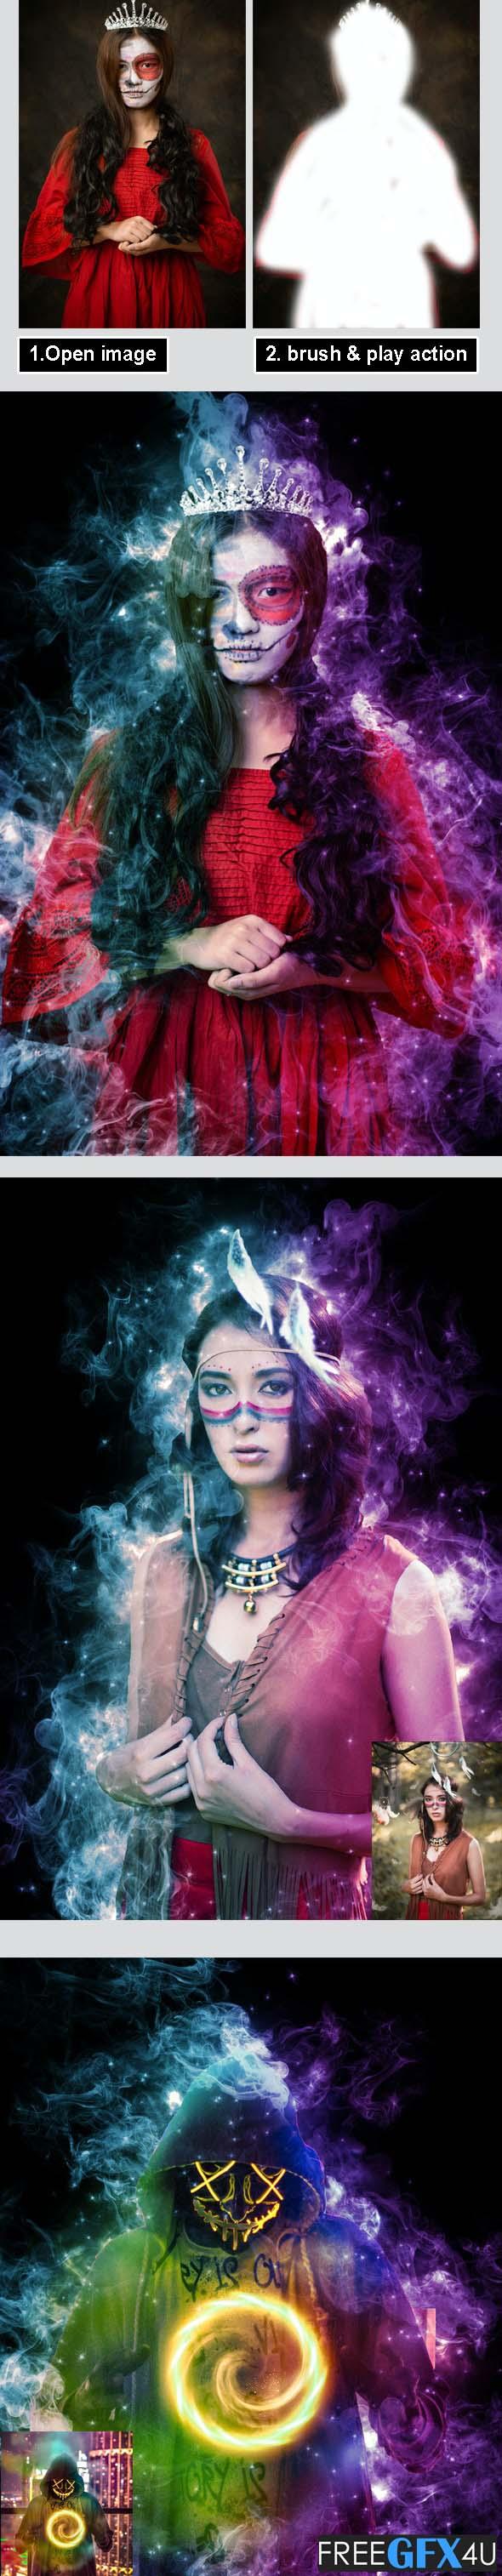 Magic Dust Photoshop Action